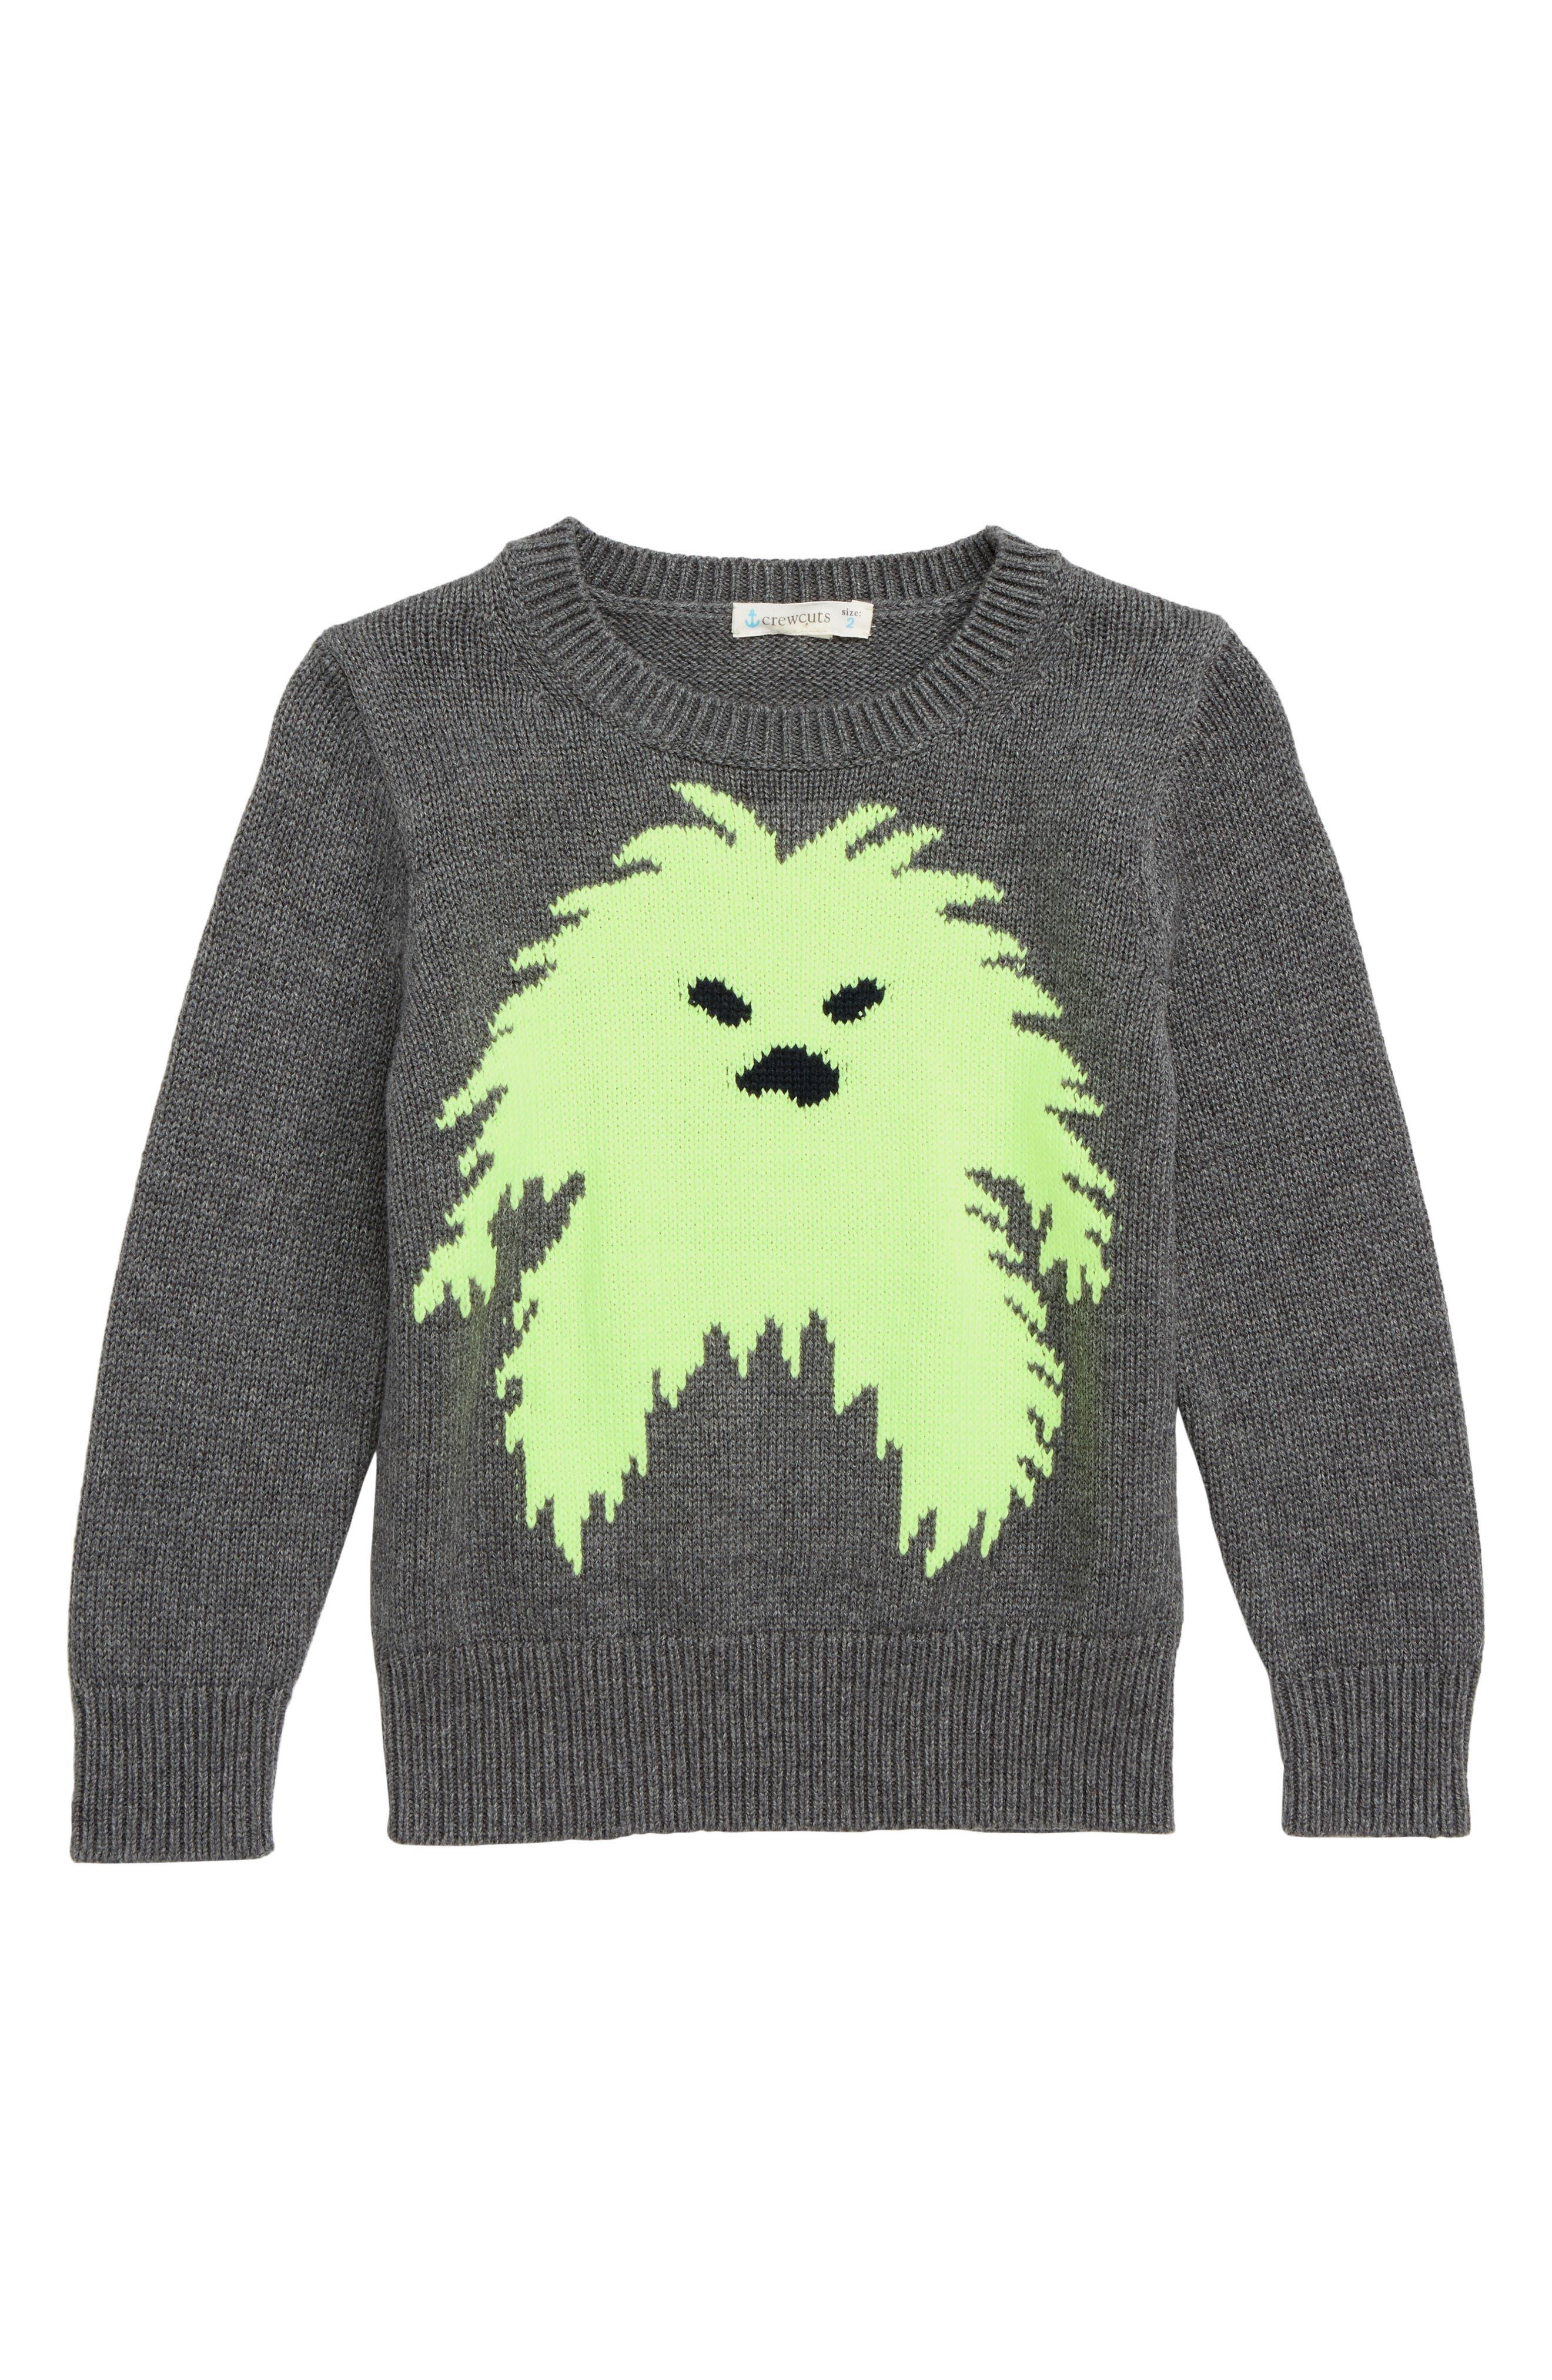 CREWCUTS BY J.CREW Yeti Sweater, Main, color, NEON GREEN